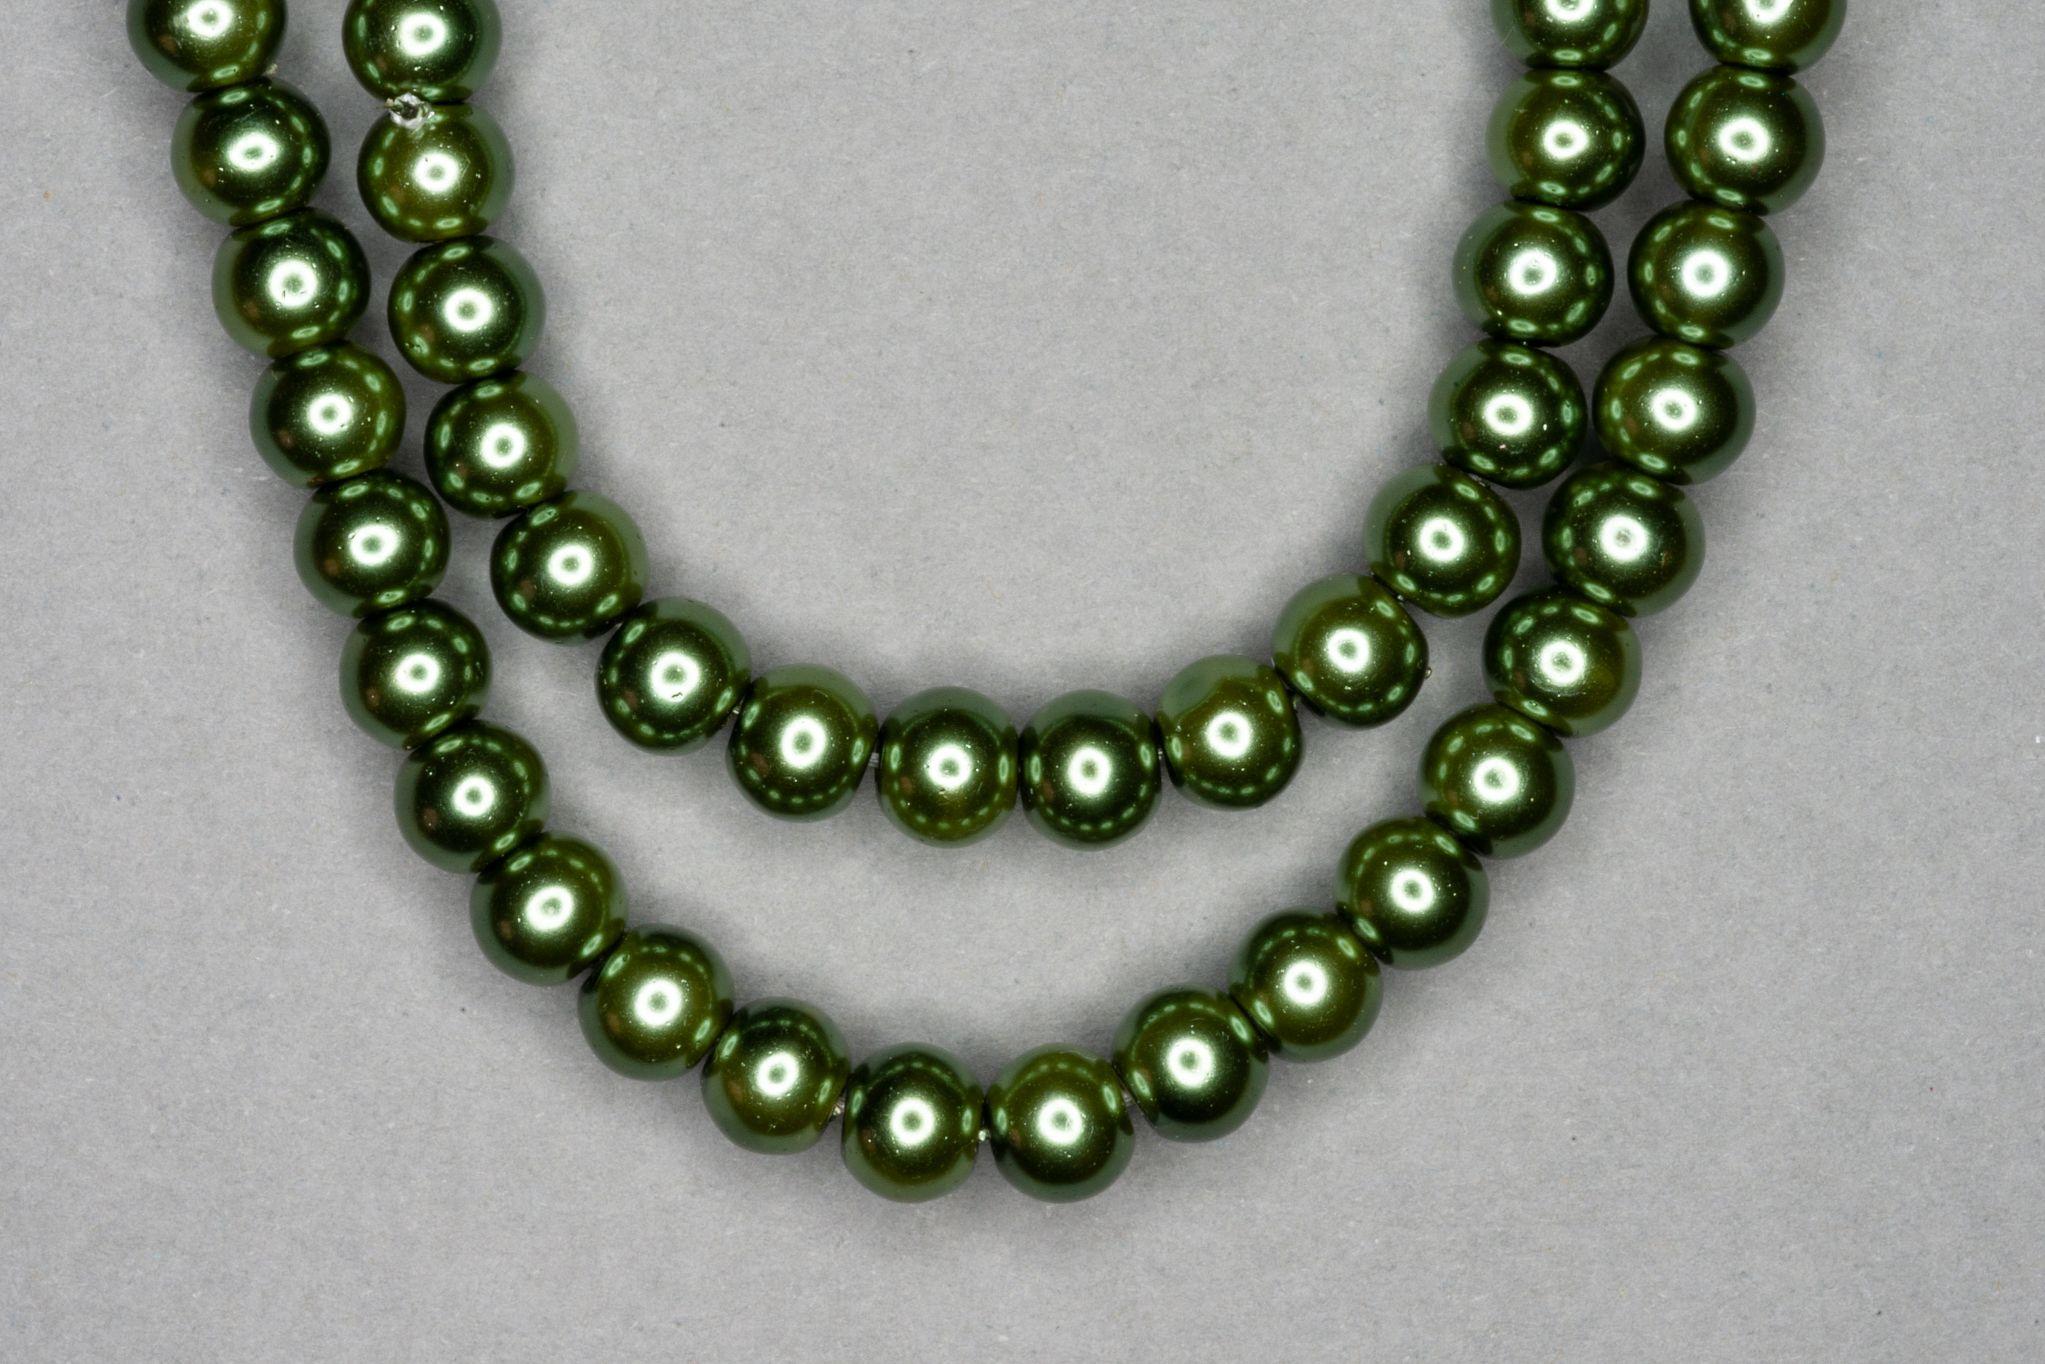 Fern Pearl Glass Beads